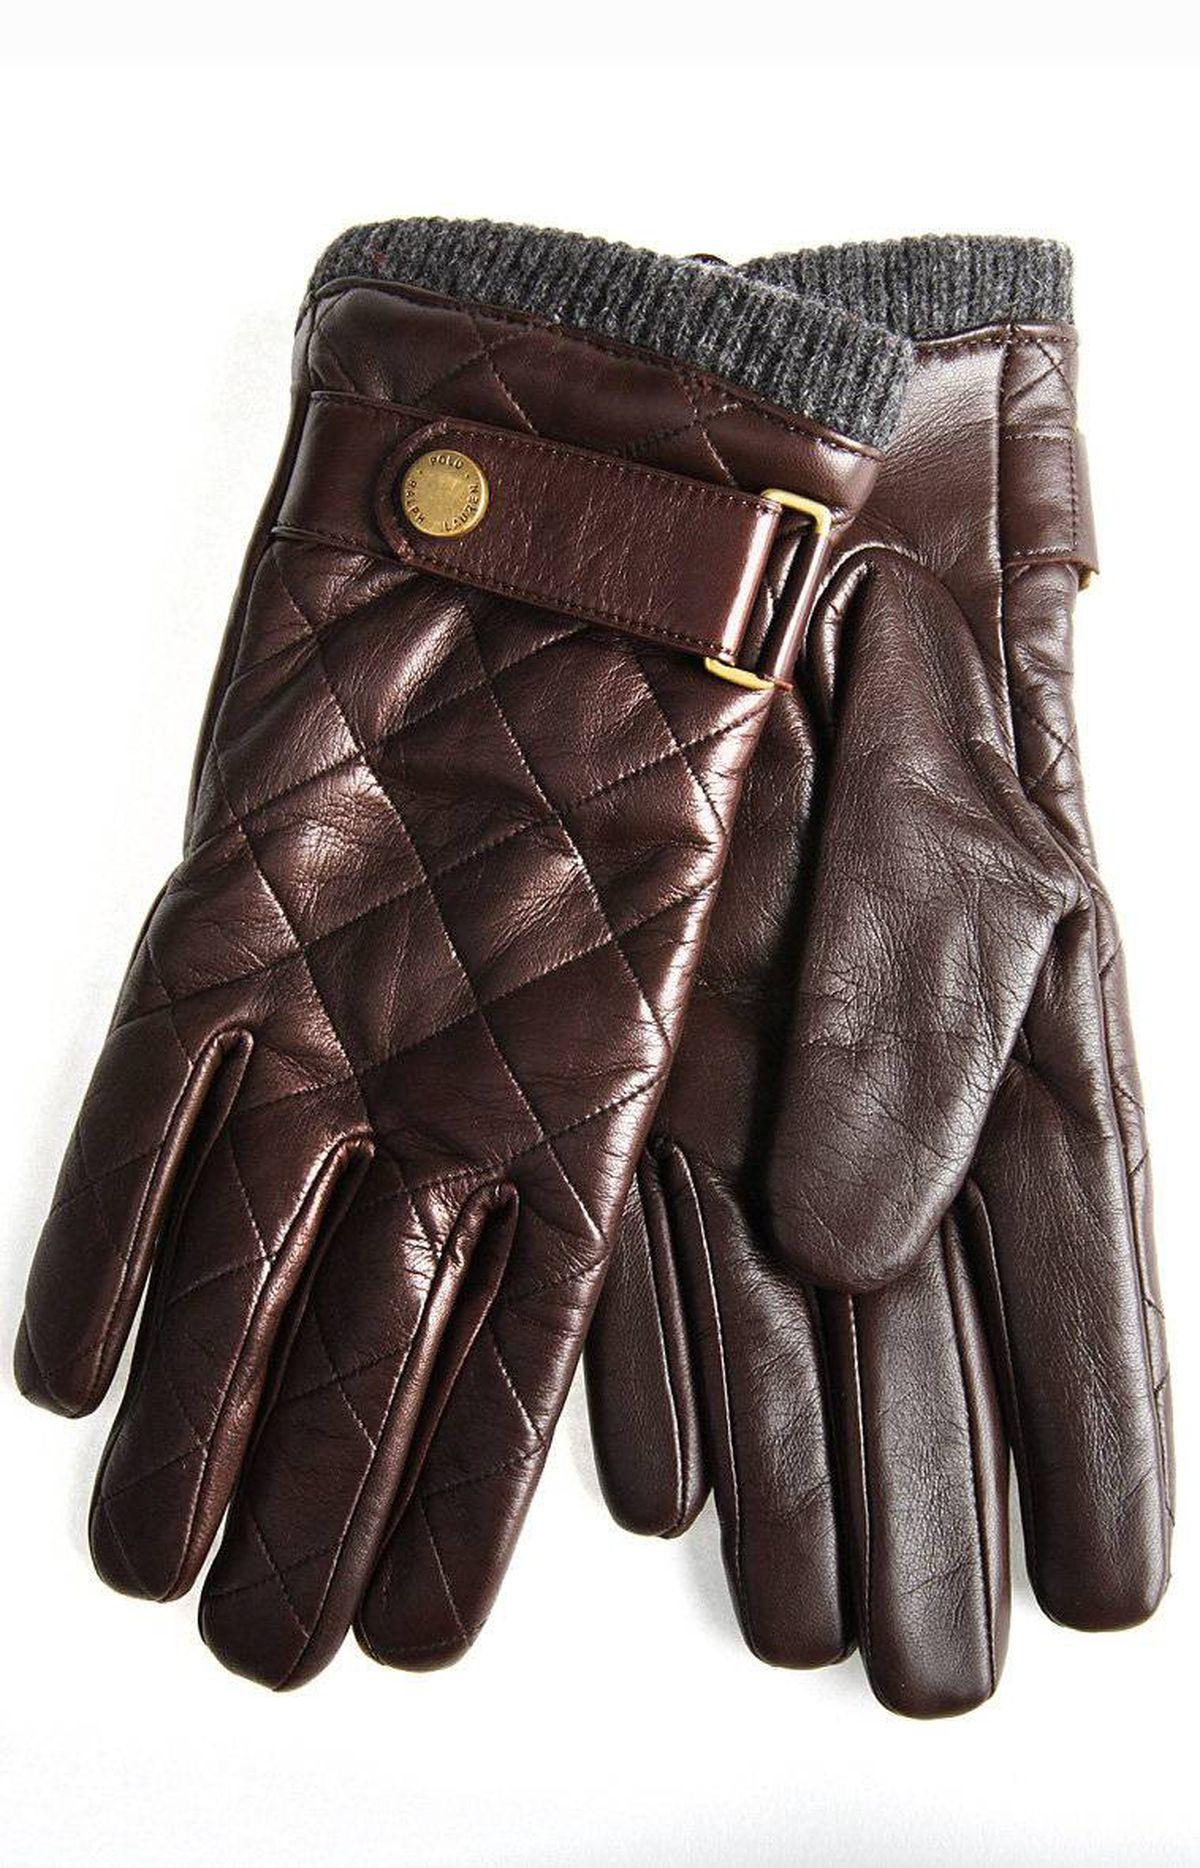 Brown Ralph Lauren gloves, $98 at the Bay (www.hbc.com).